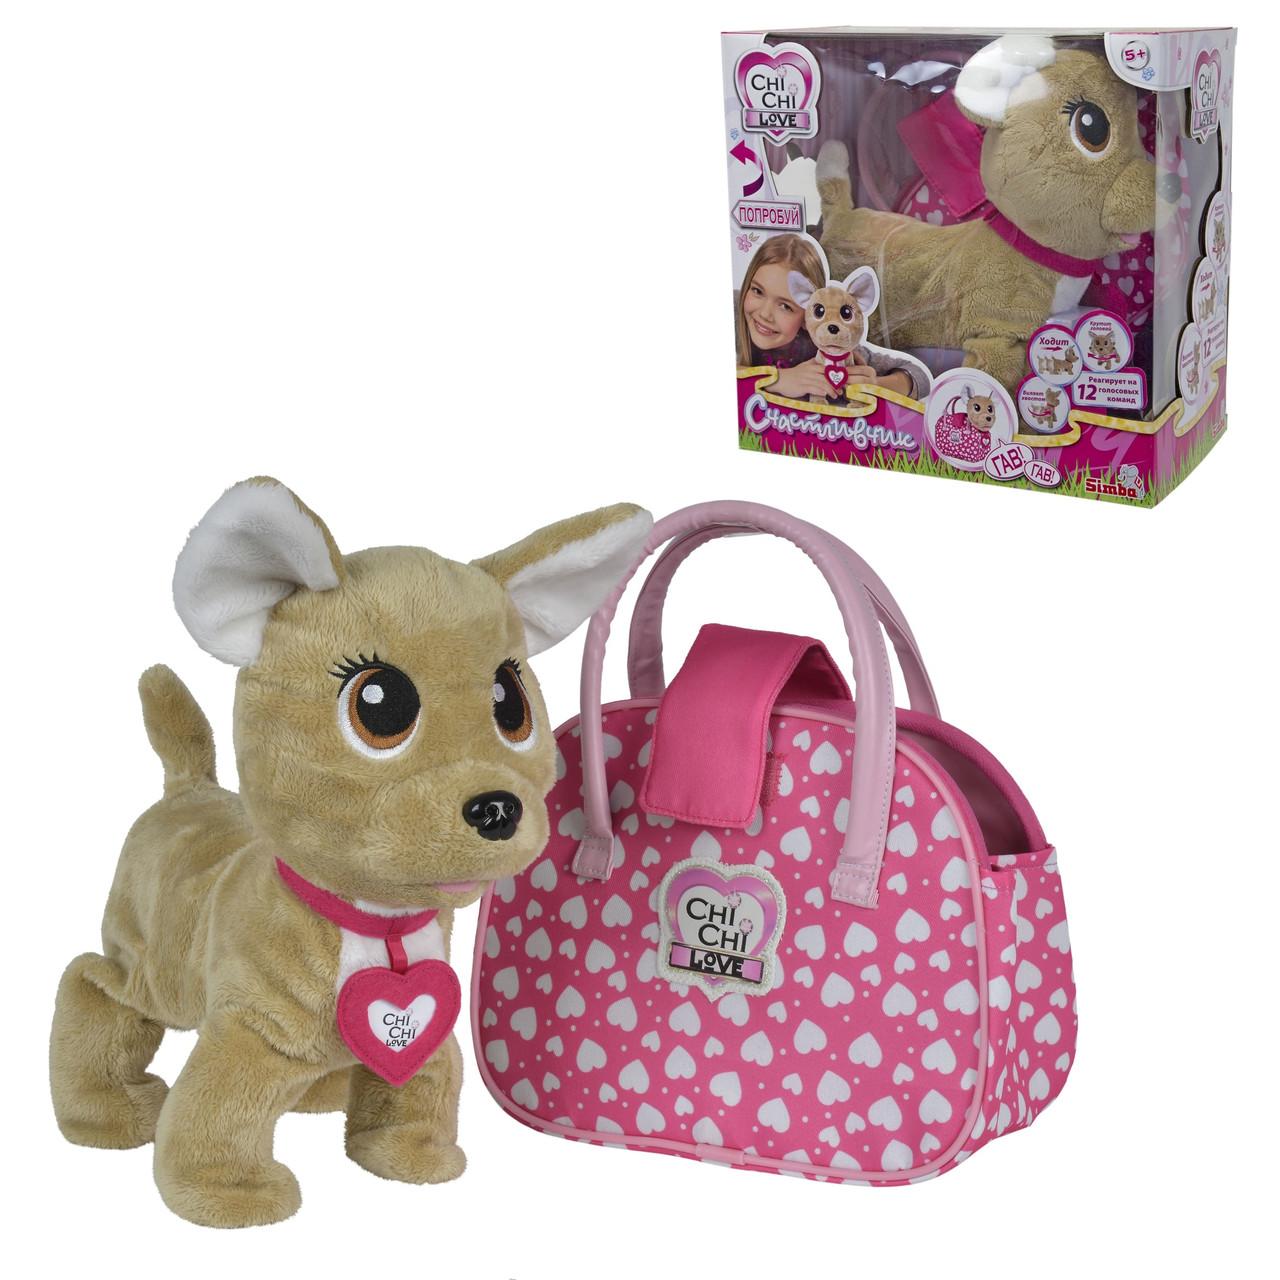 Интерактивная собачка Simba Chi-Chi love Счастливчик с сумочкой